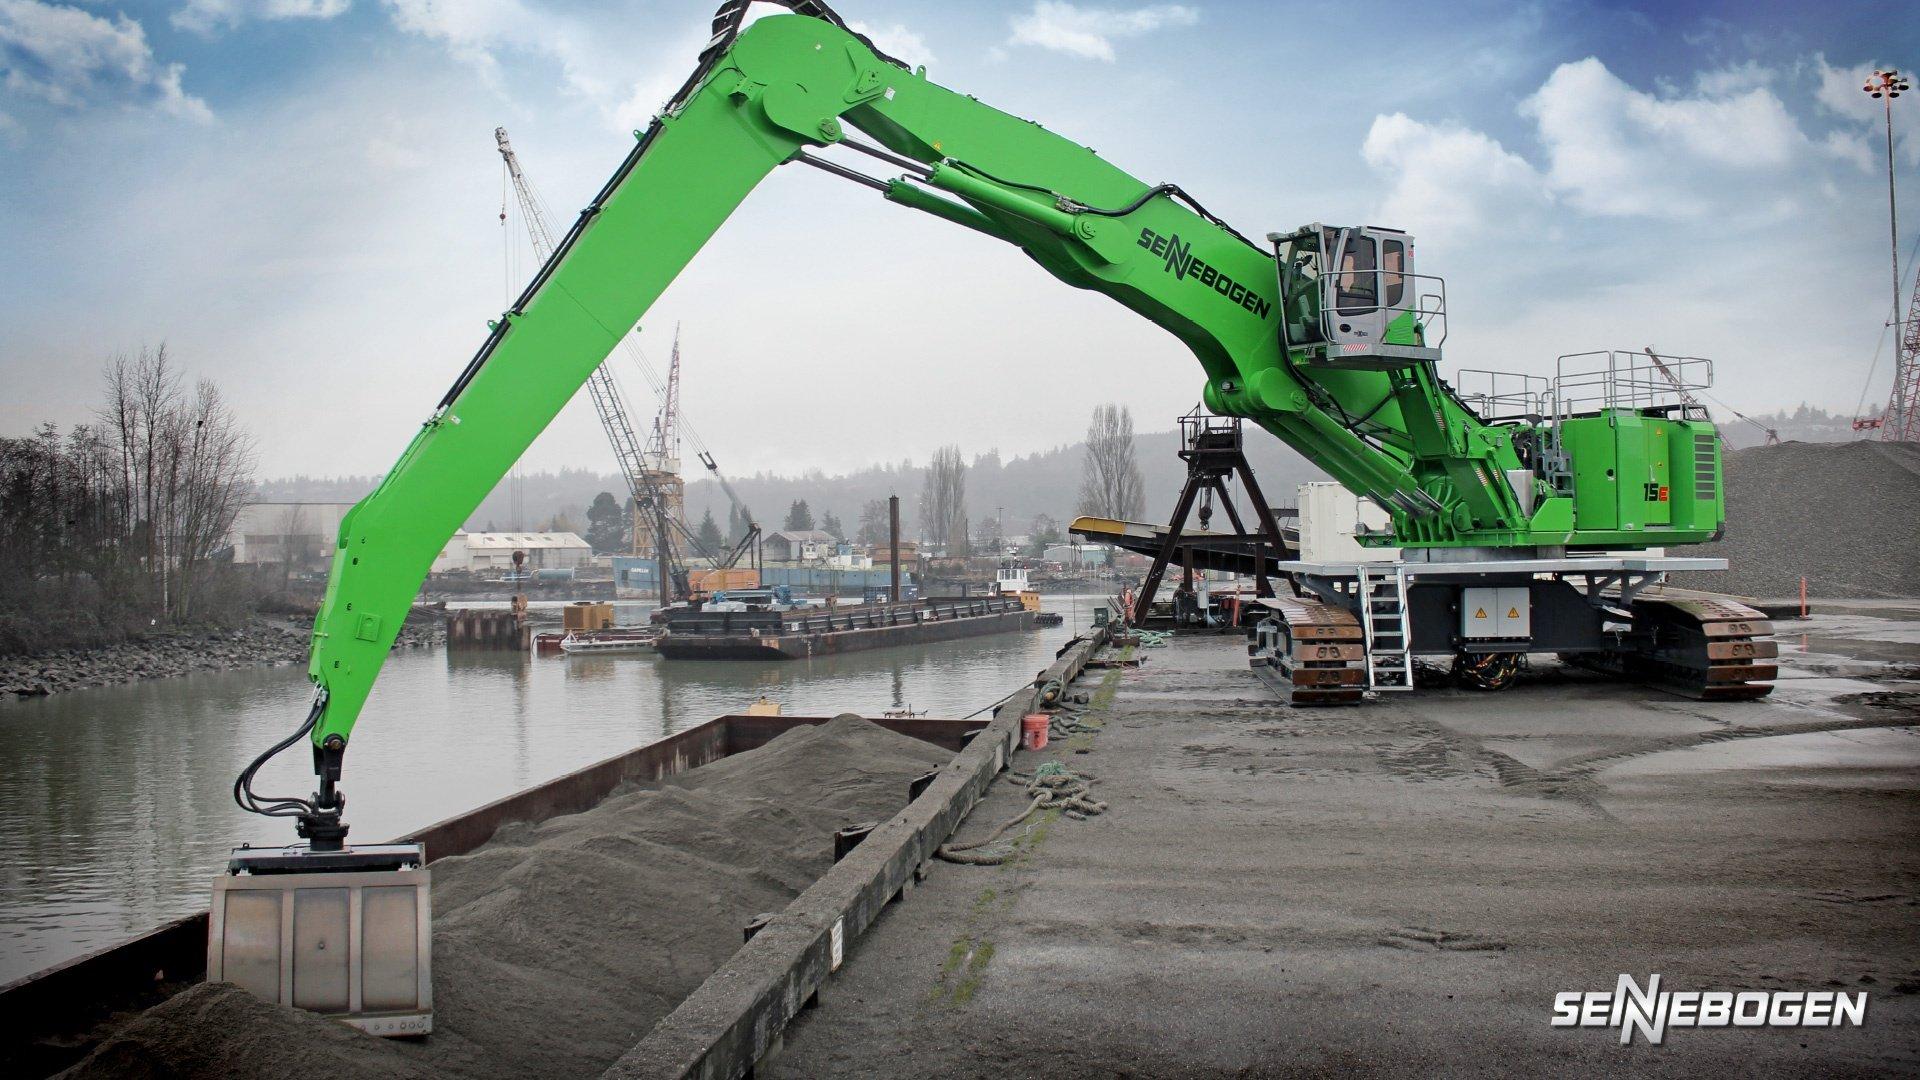 Image of a sennebogen machine operating at a port